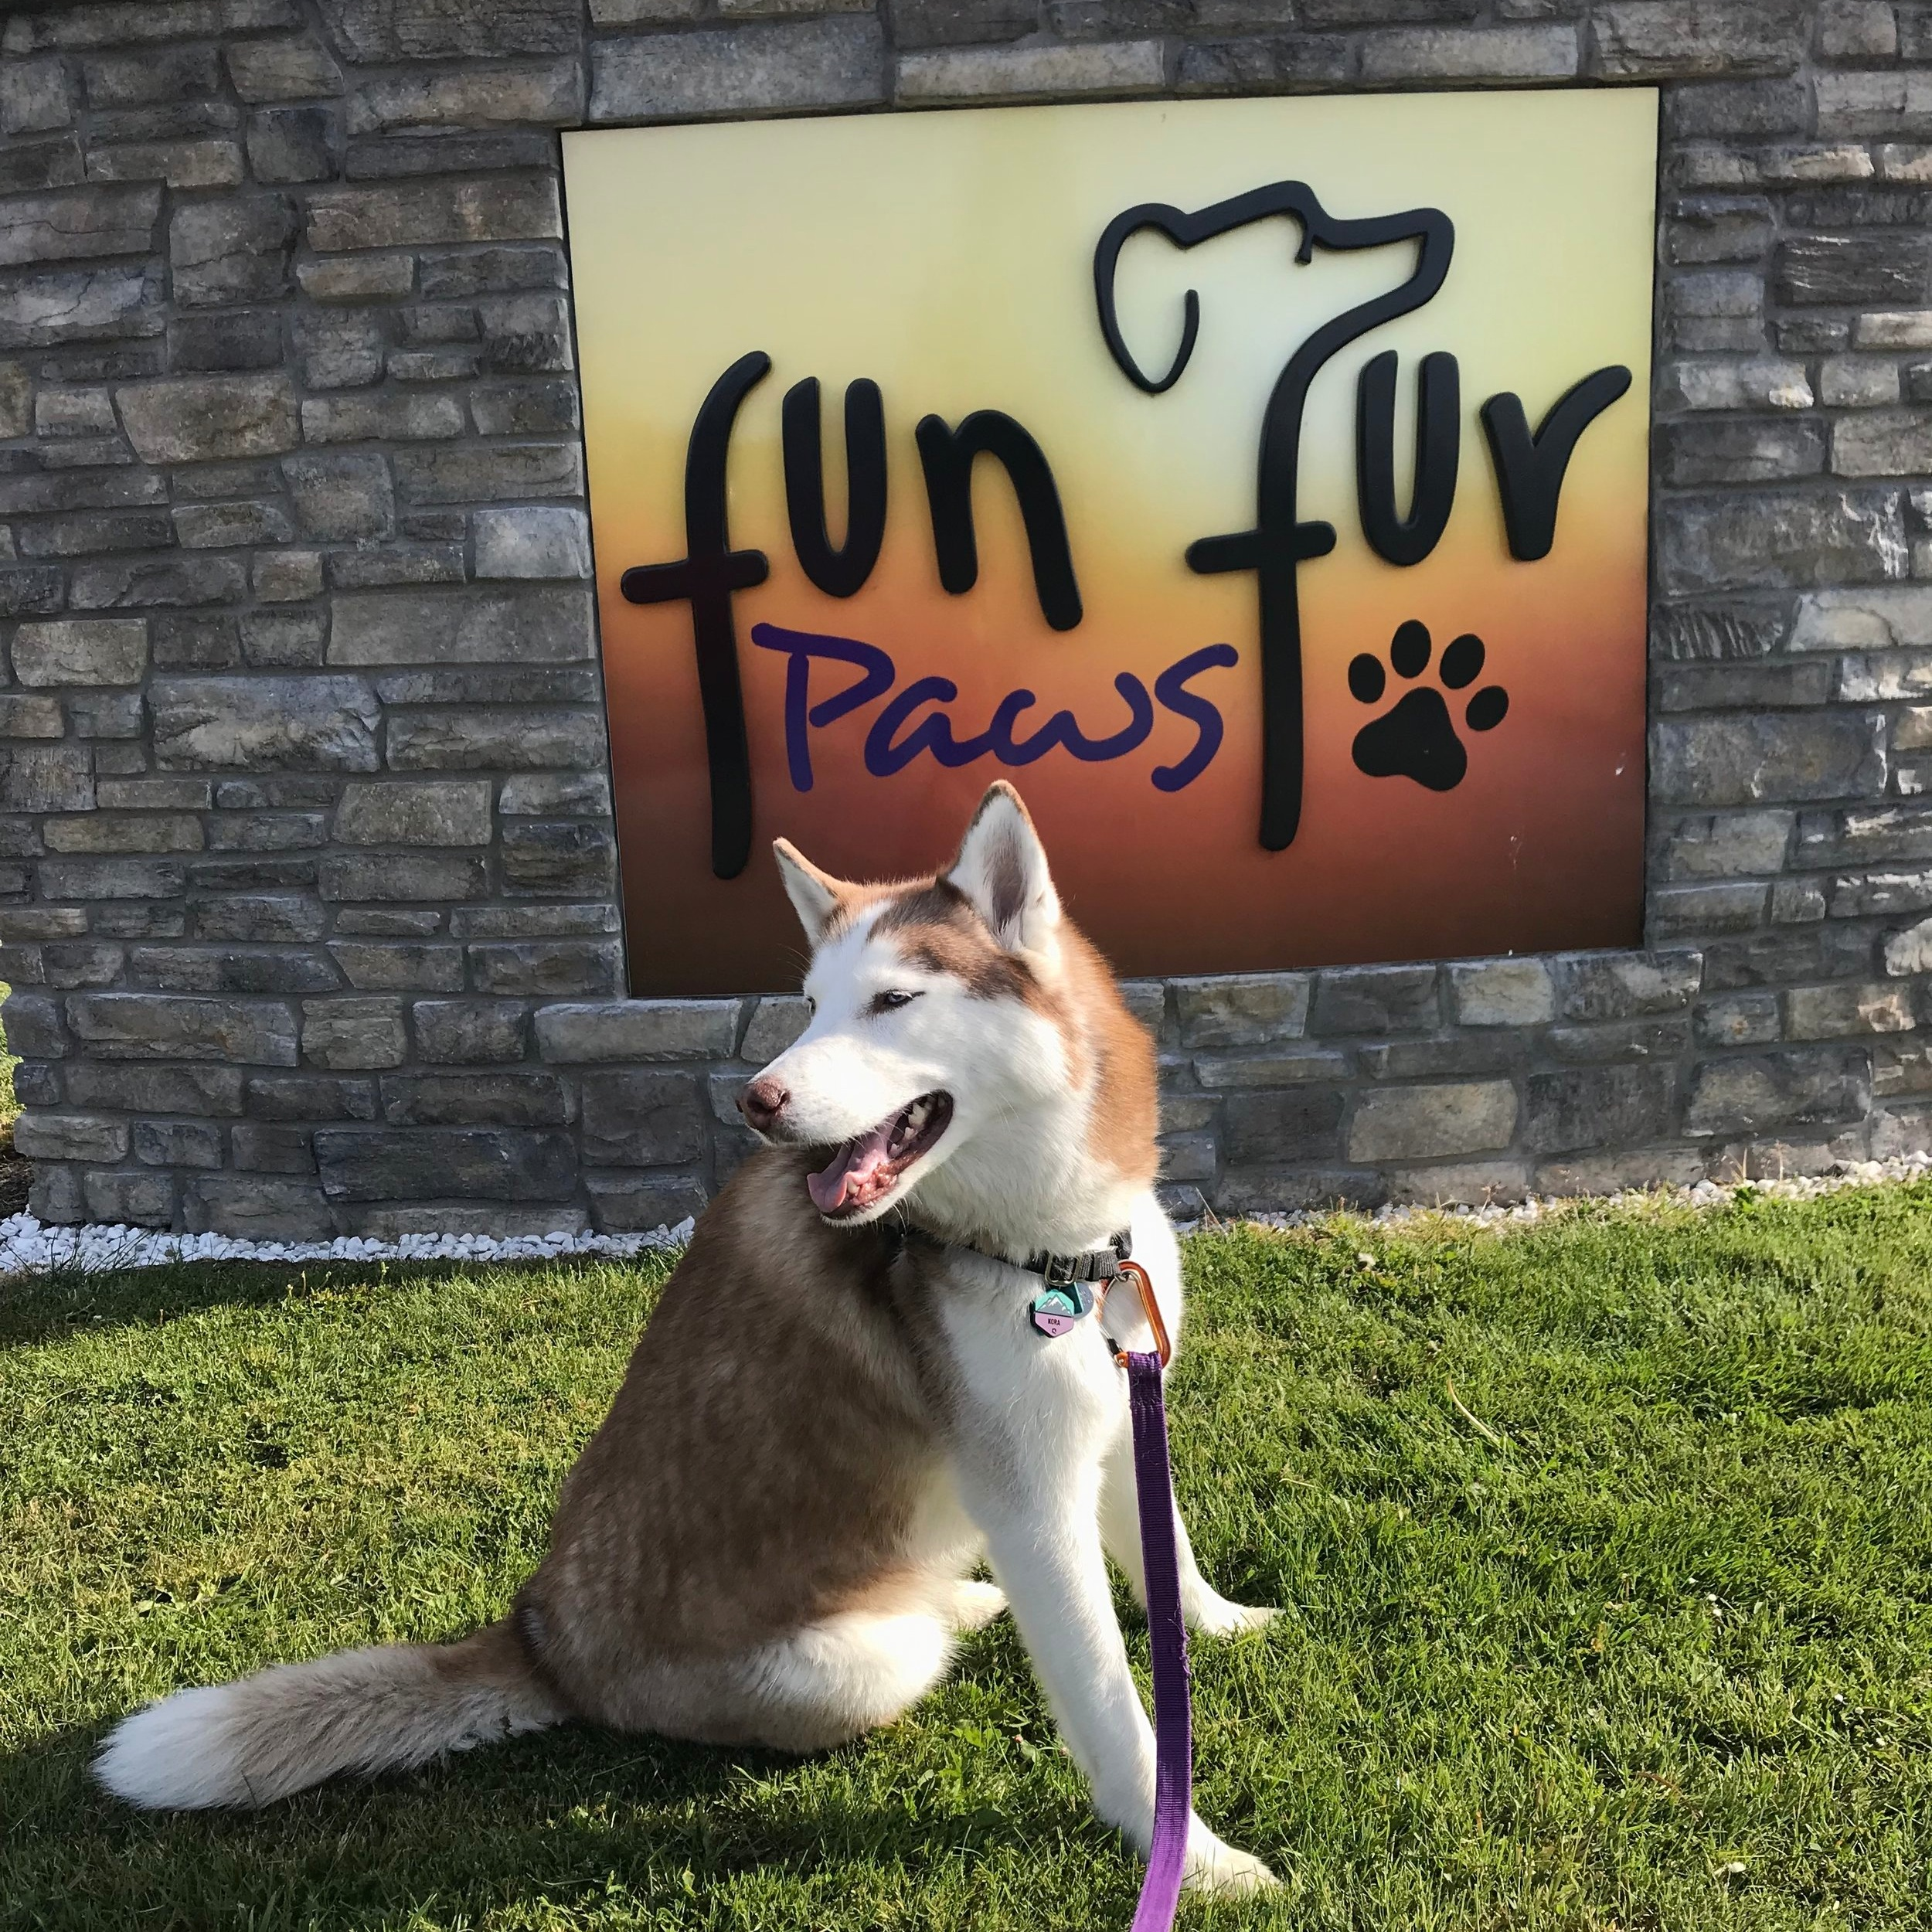 Fun+Fur+Paws+3.jpg